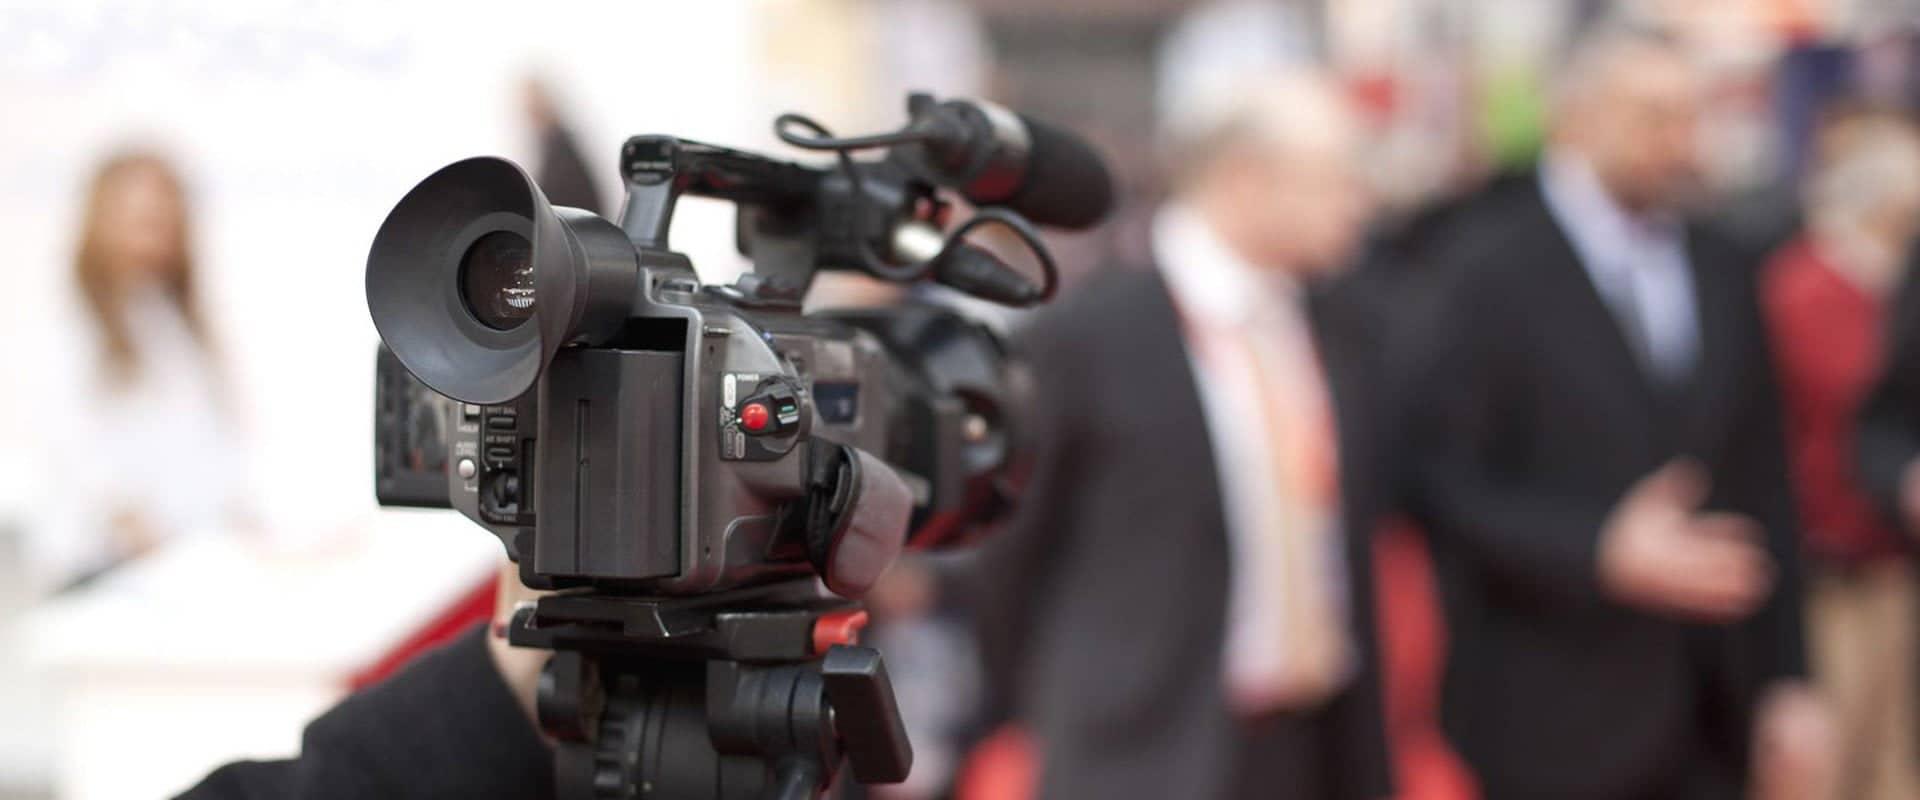 Live Streaming for Business - Jum Media